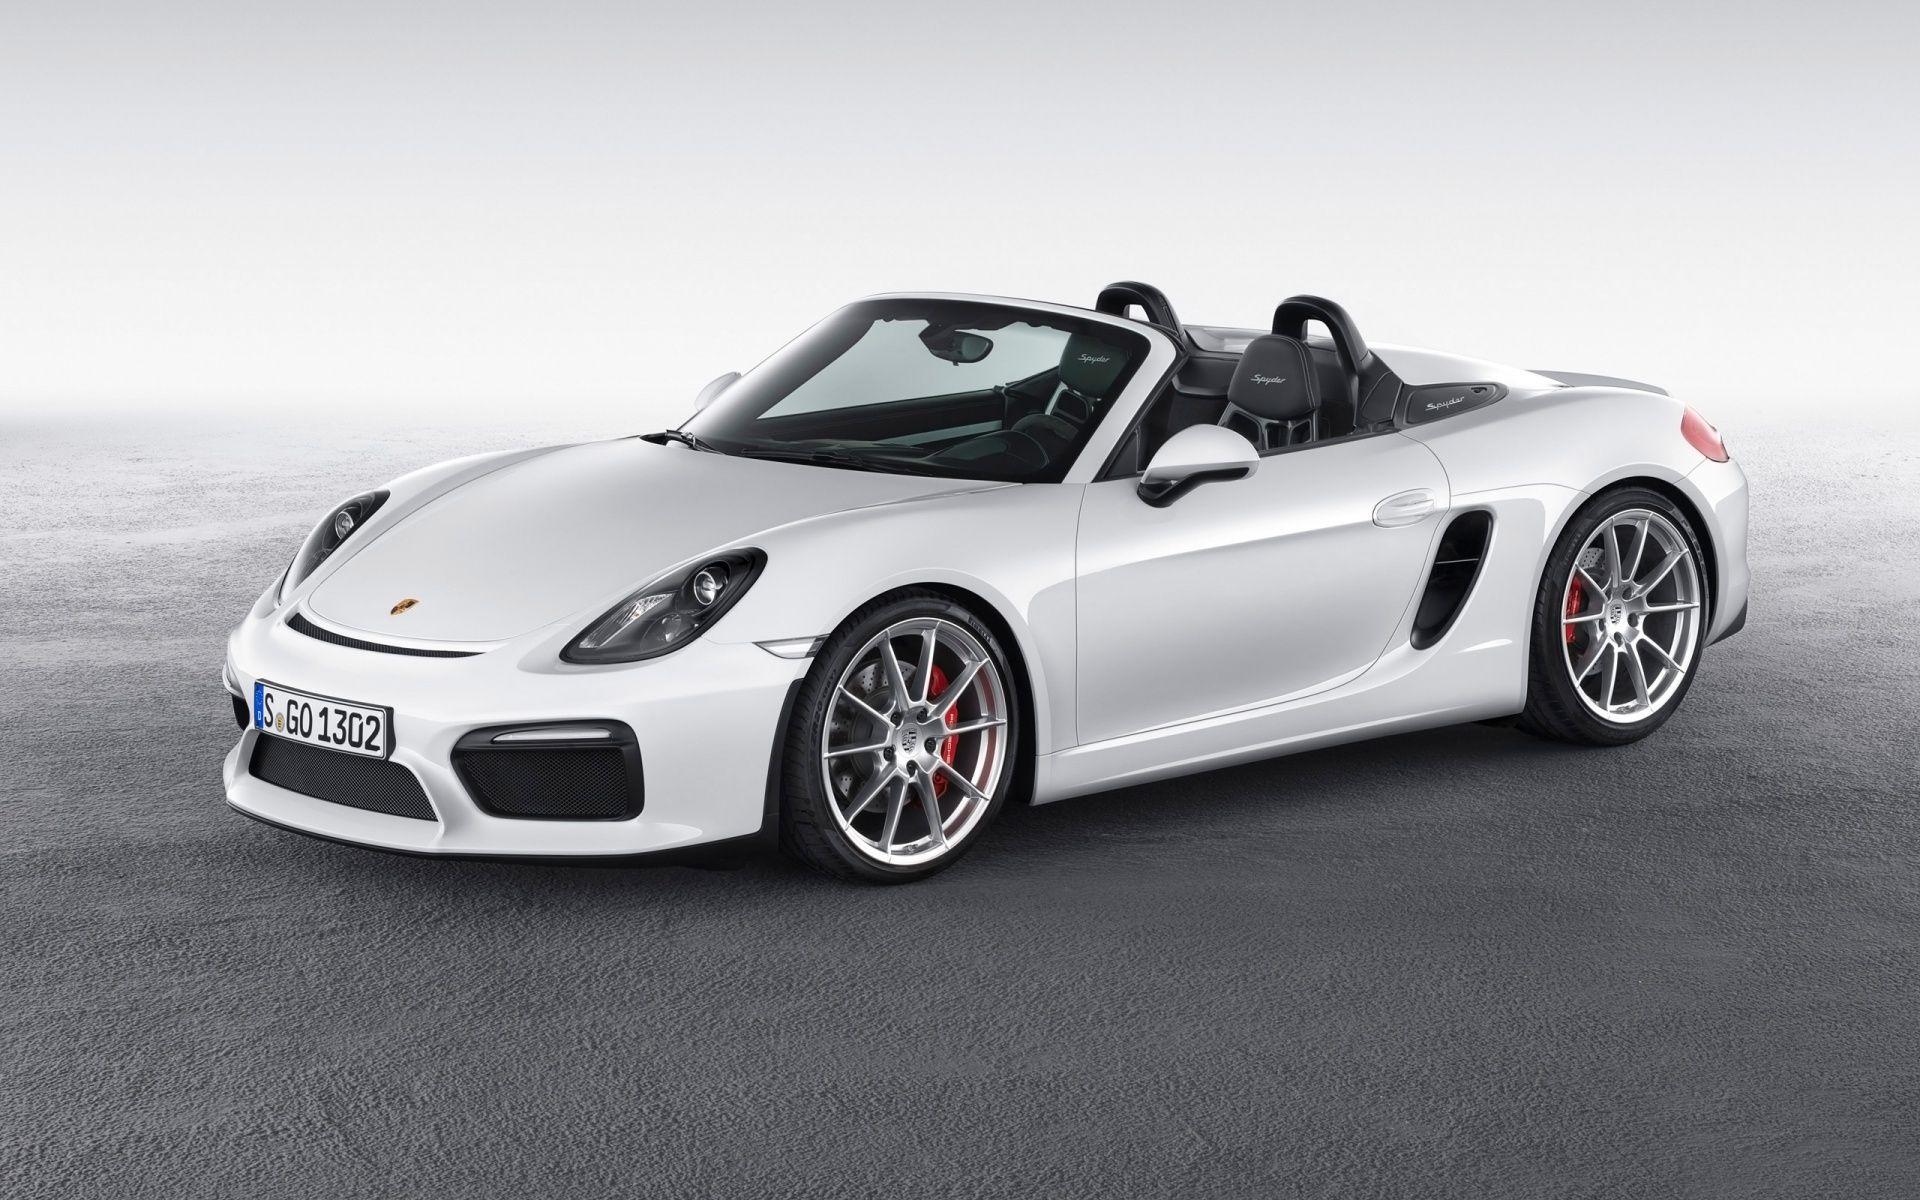 8a8255acec10d659cf77e135229f46fc Stunning Ficha Tecnica Porsche 918 Spyder Concept Cars Trend